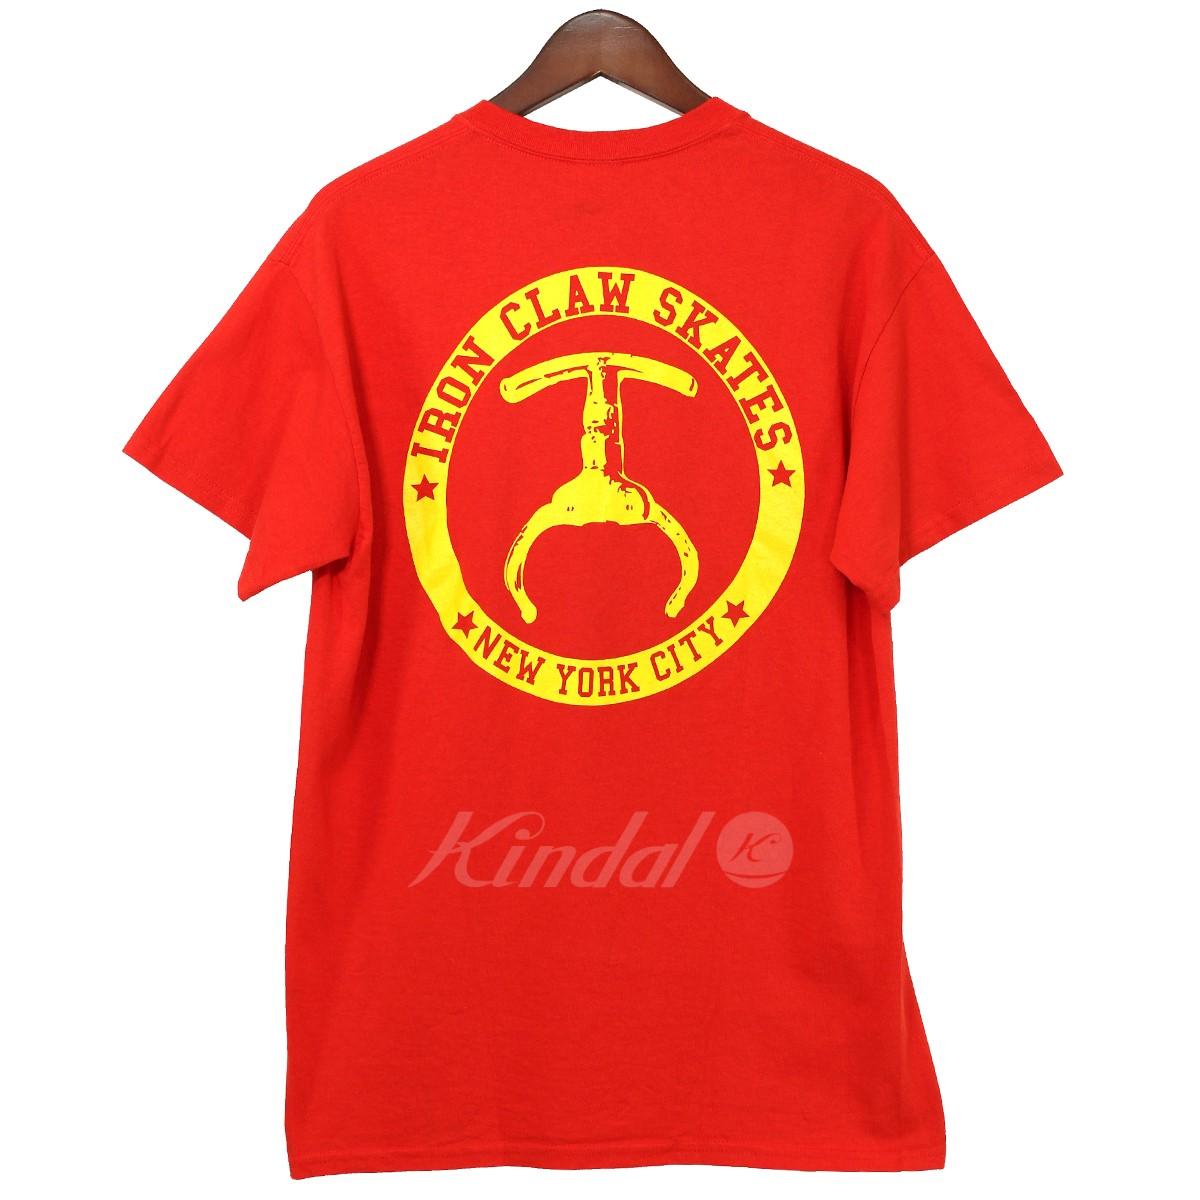 Iron On Pockets For T Shirts - Nils Stucki Kieferorthopäde